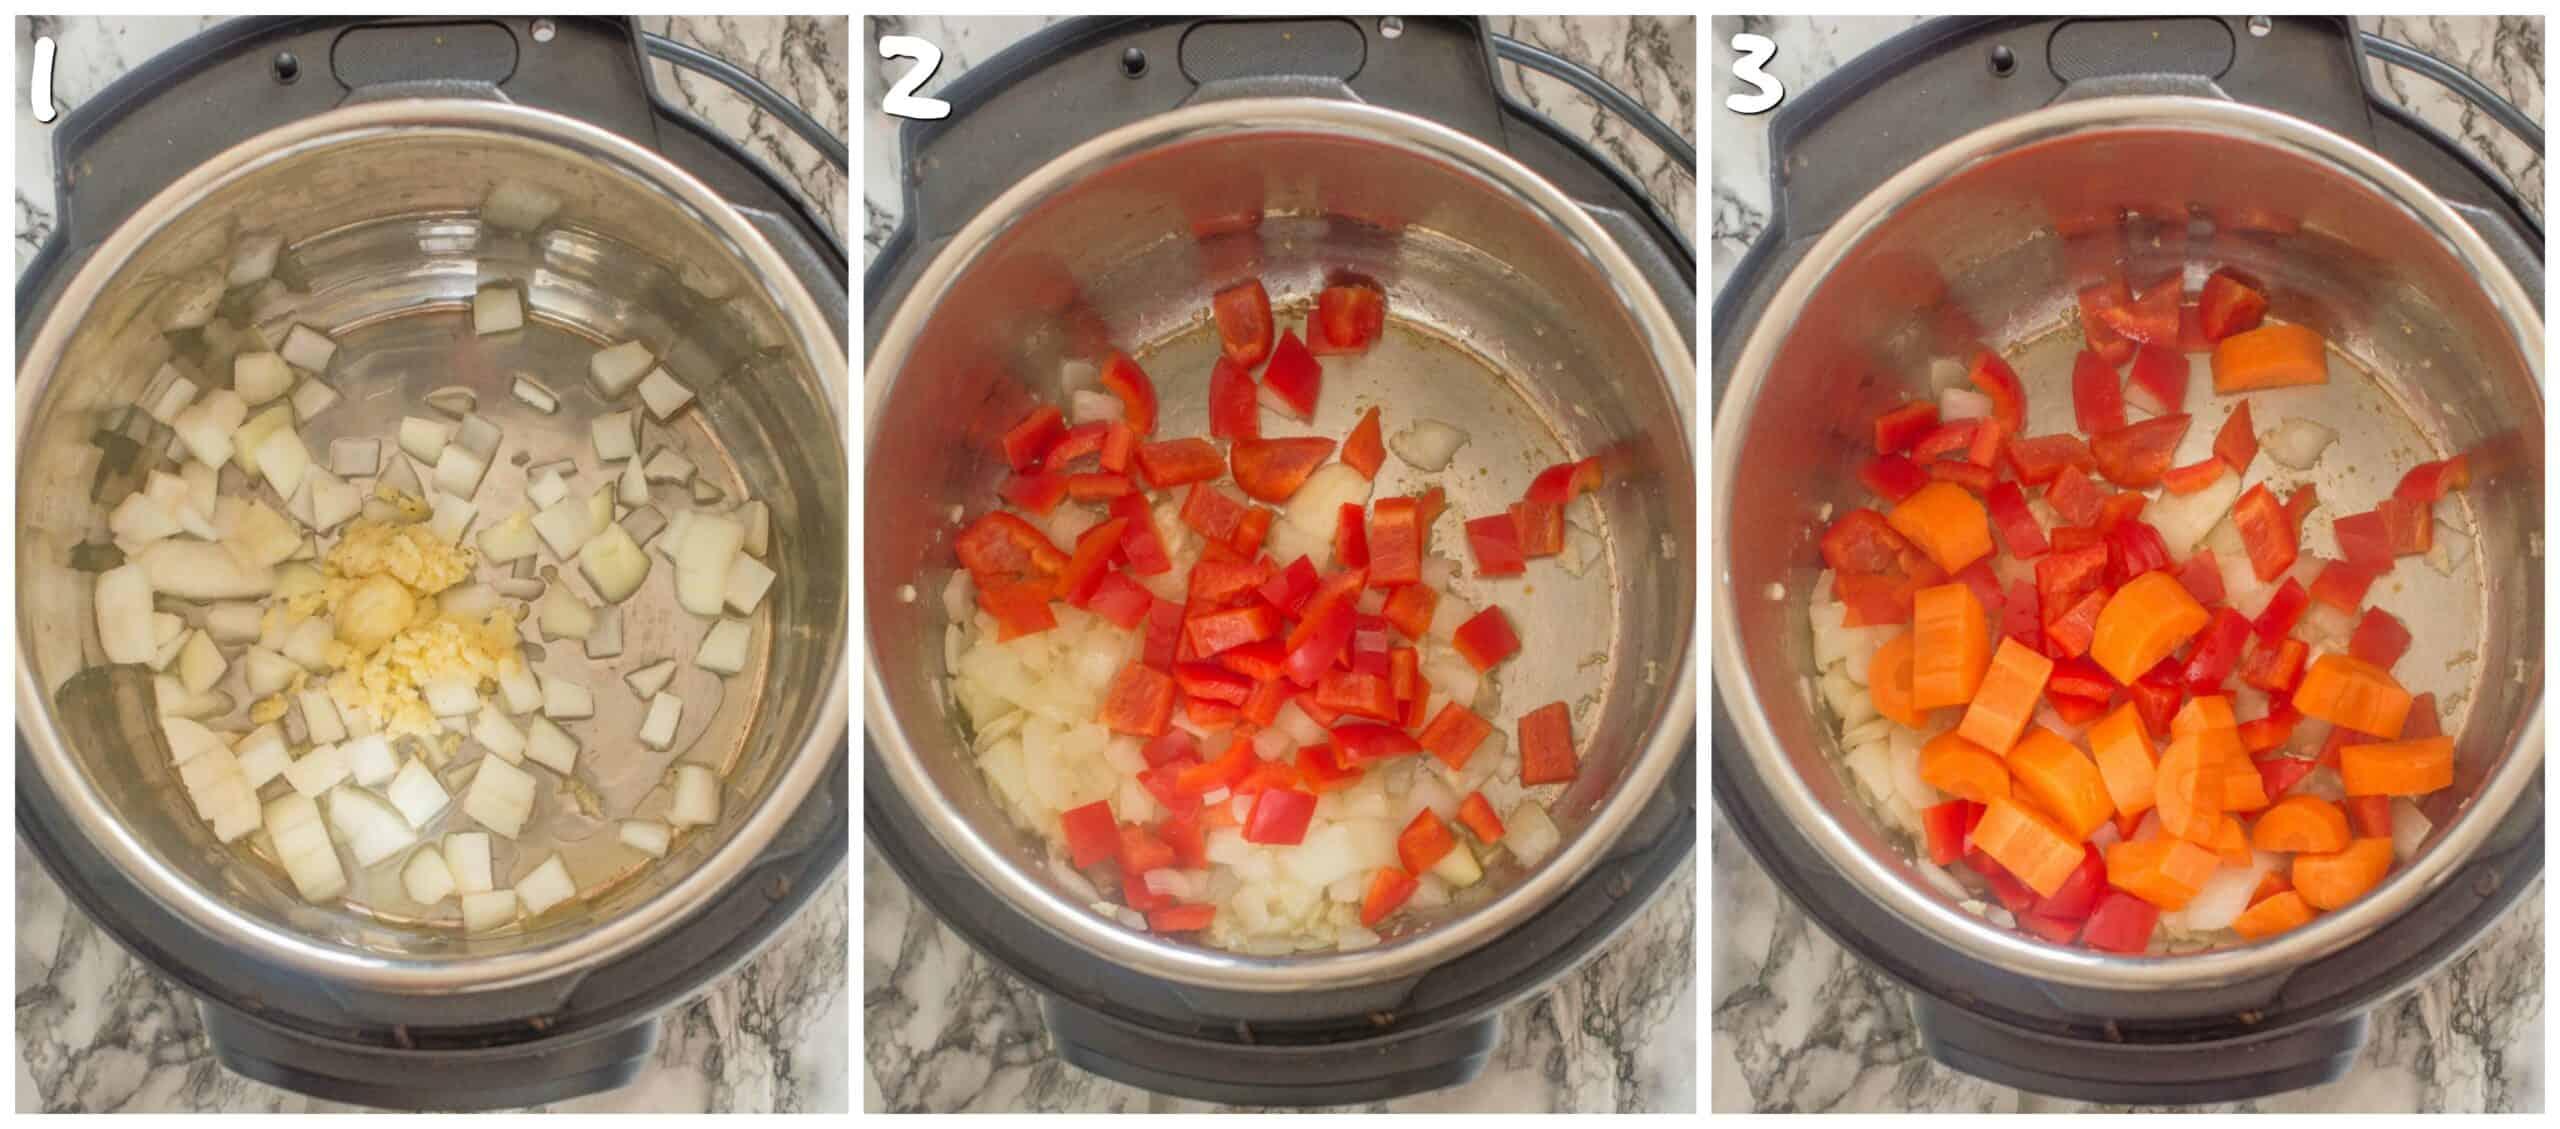 steps 1-3 sauteing vegetables